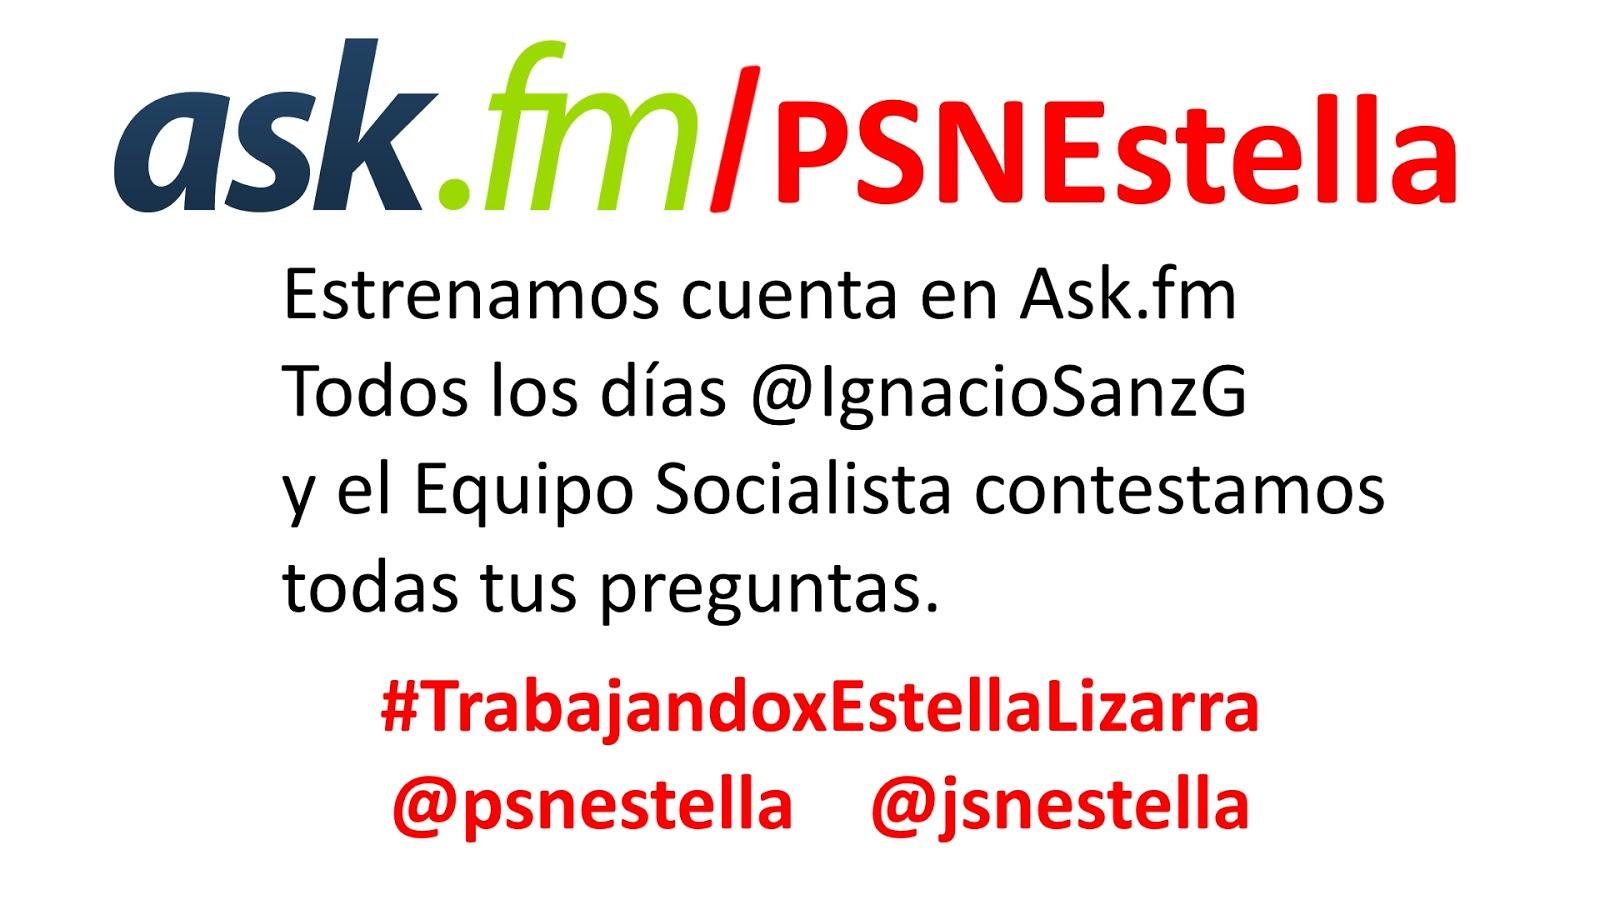 Ask.fm/PSNEstella